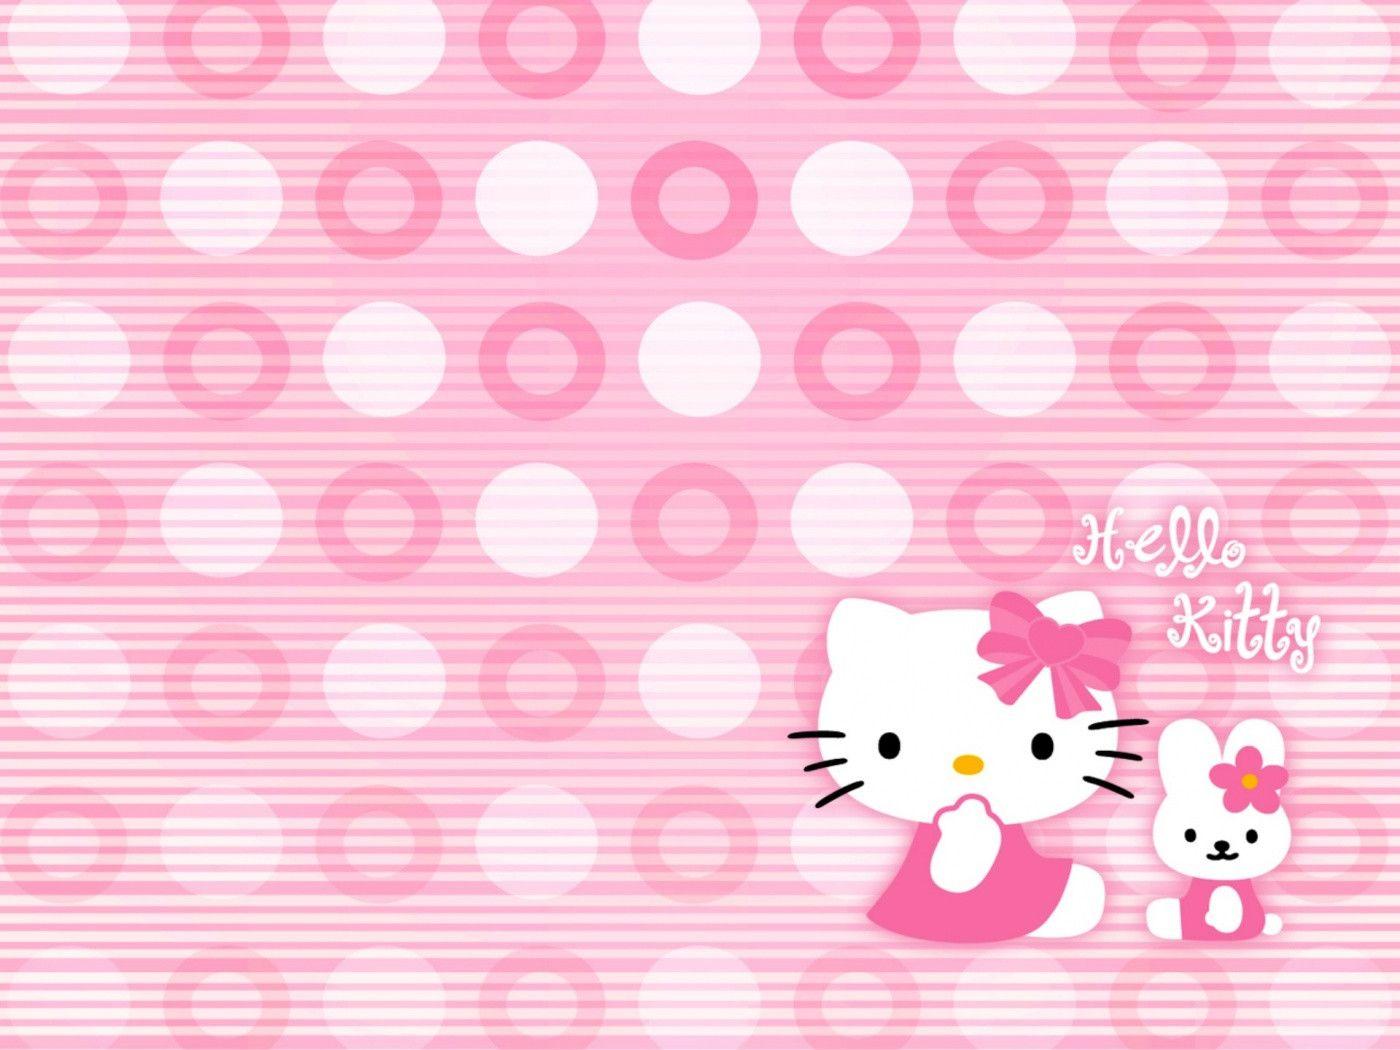 Cool Wallpaper Hello Kitty Plain - ozni0s  2018_207843.jpg